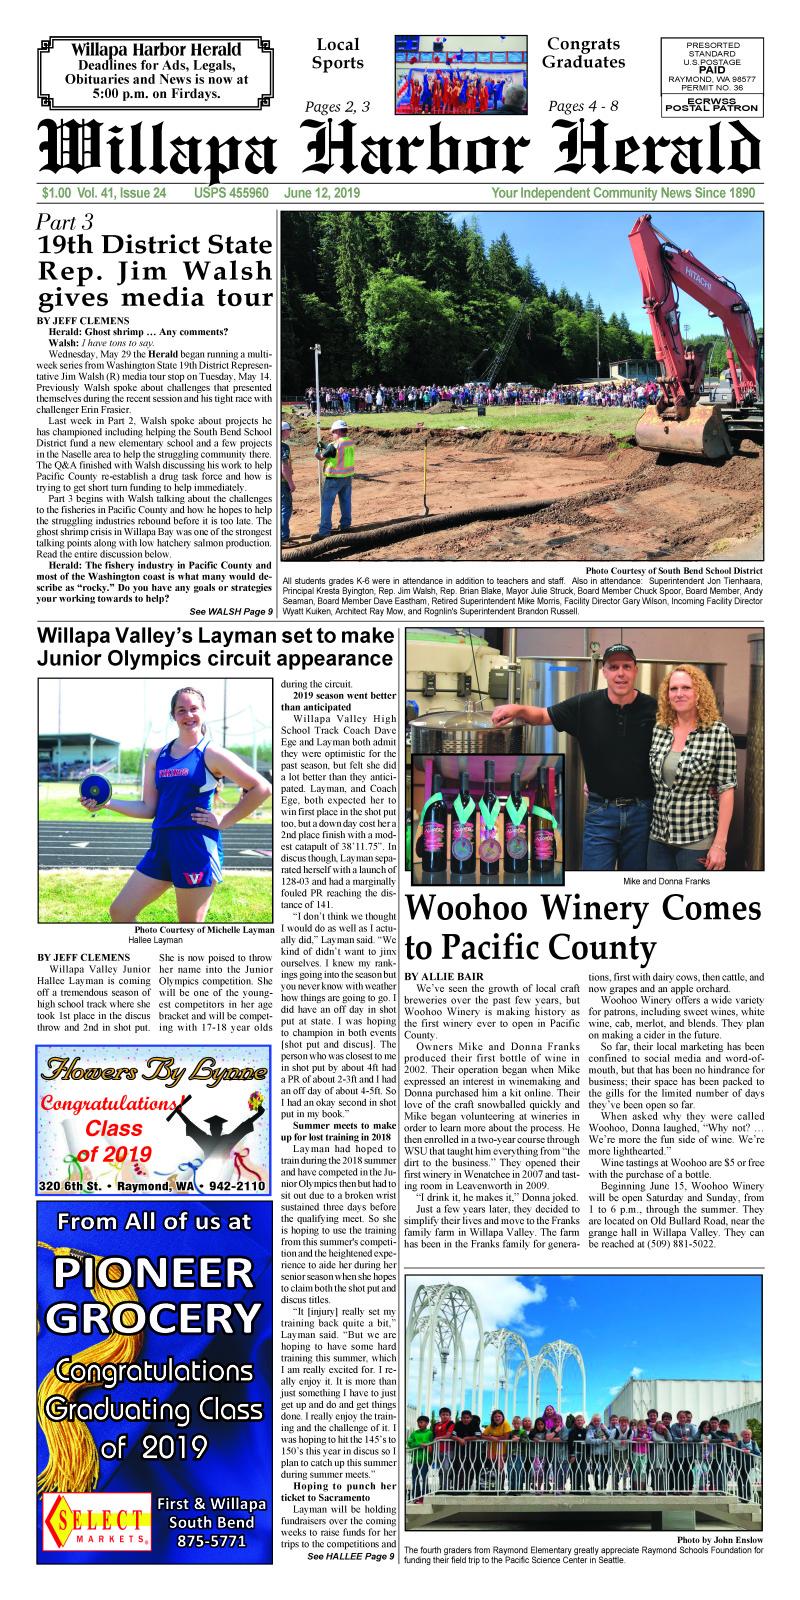 June 12, 2019 Willapa Harbor Herald